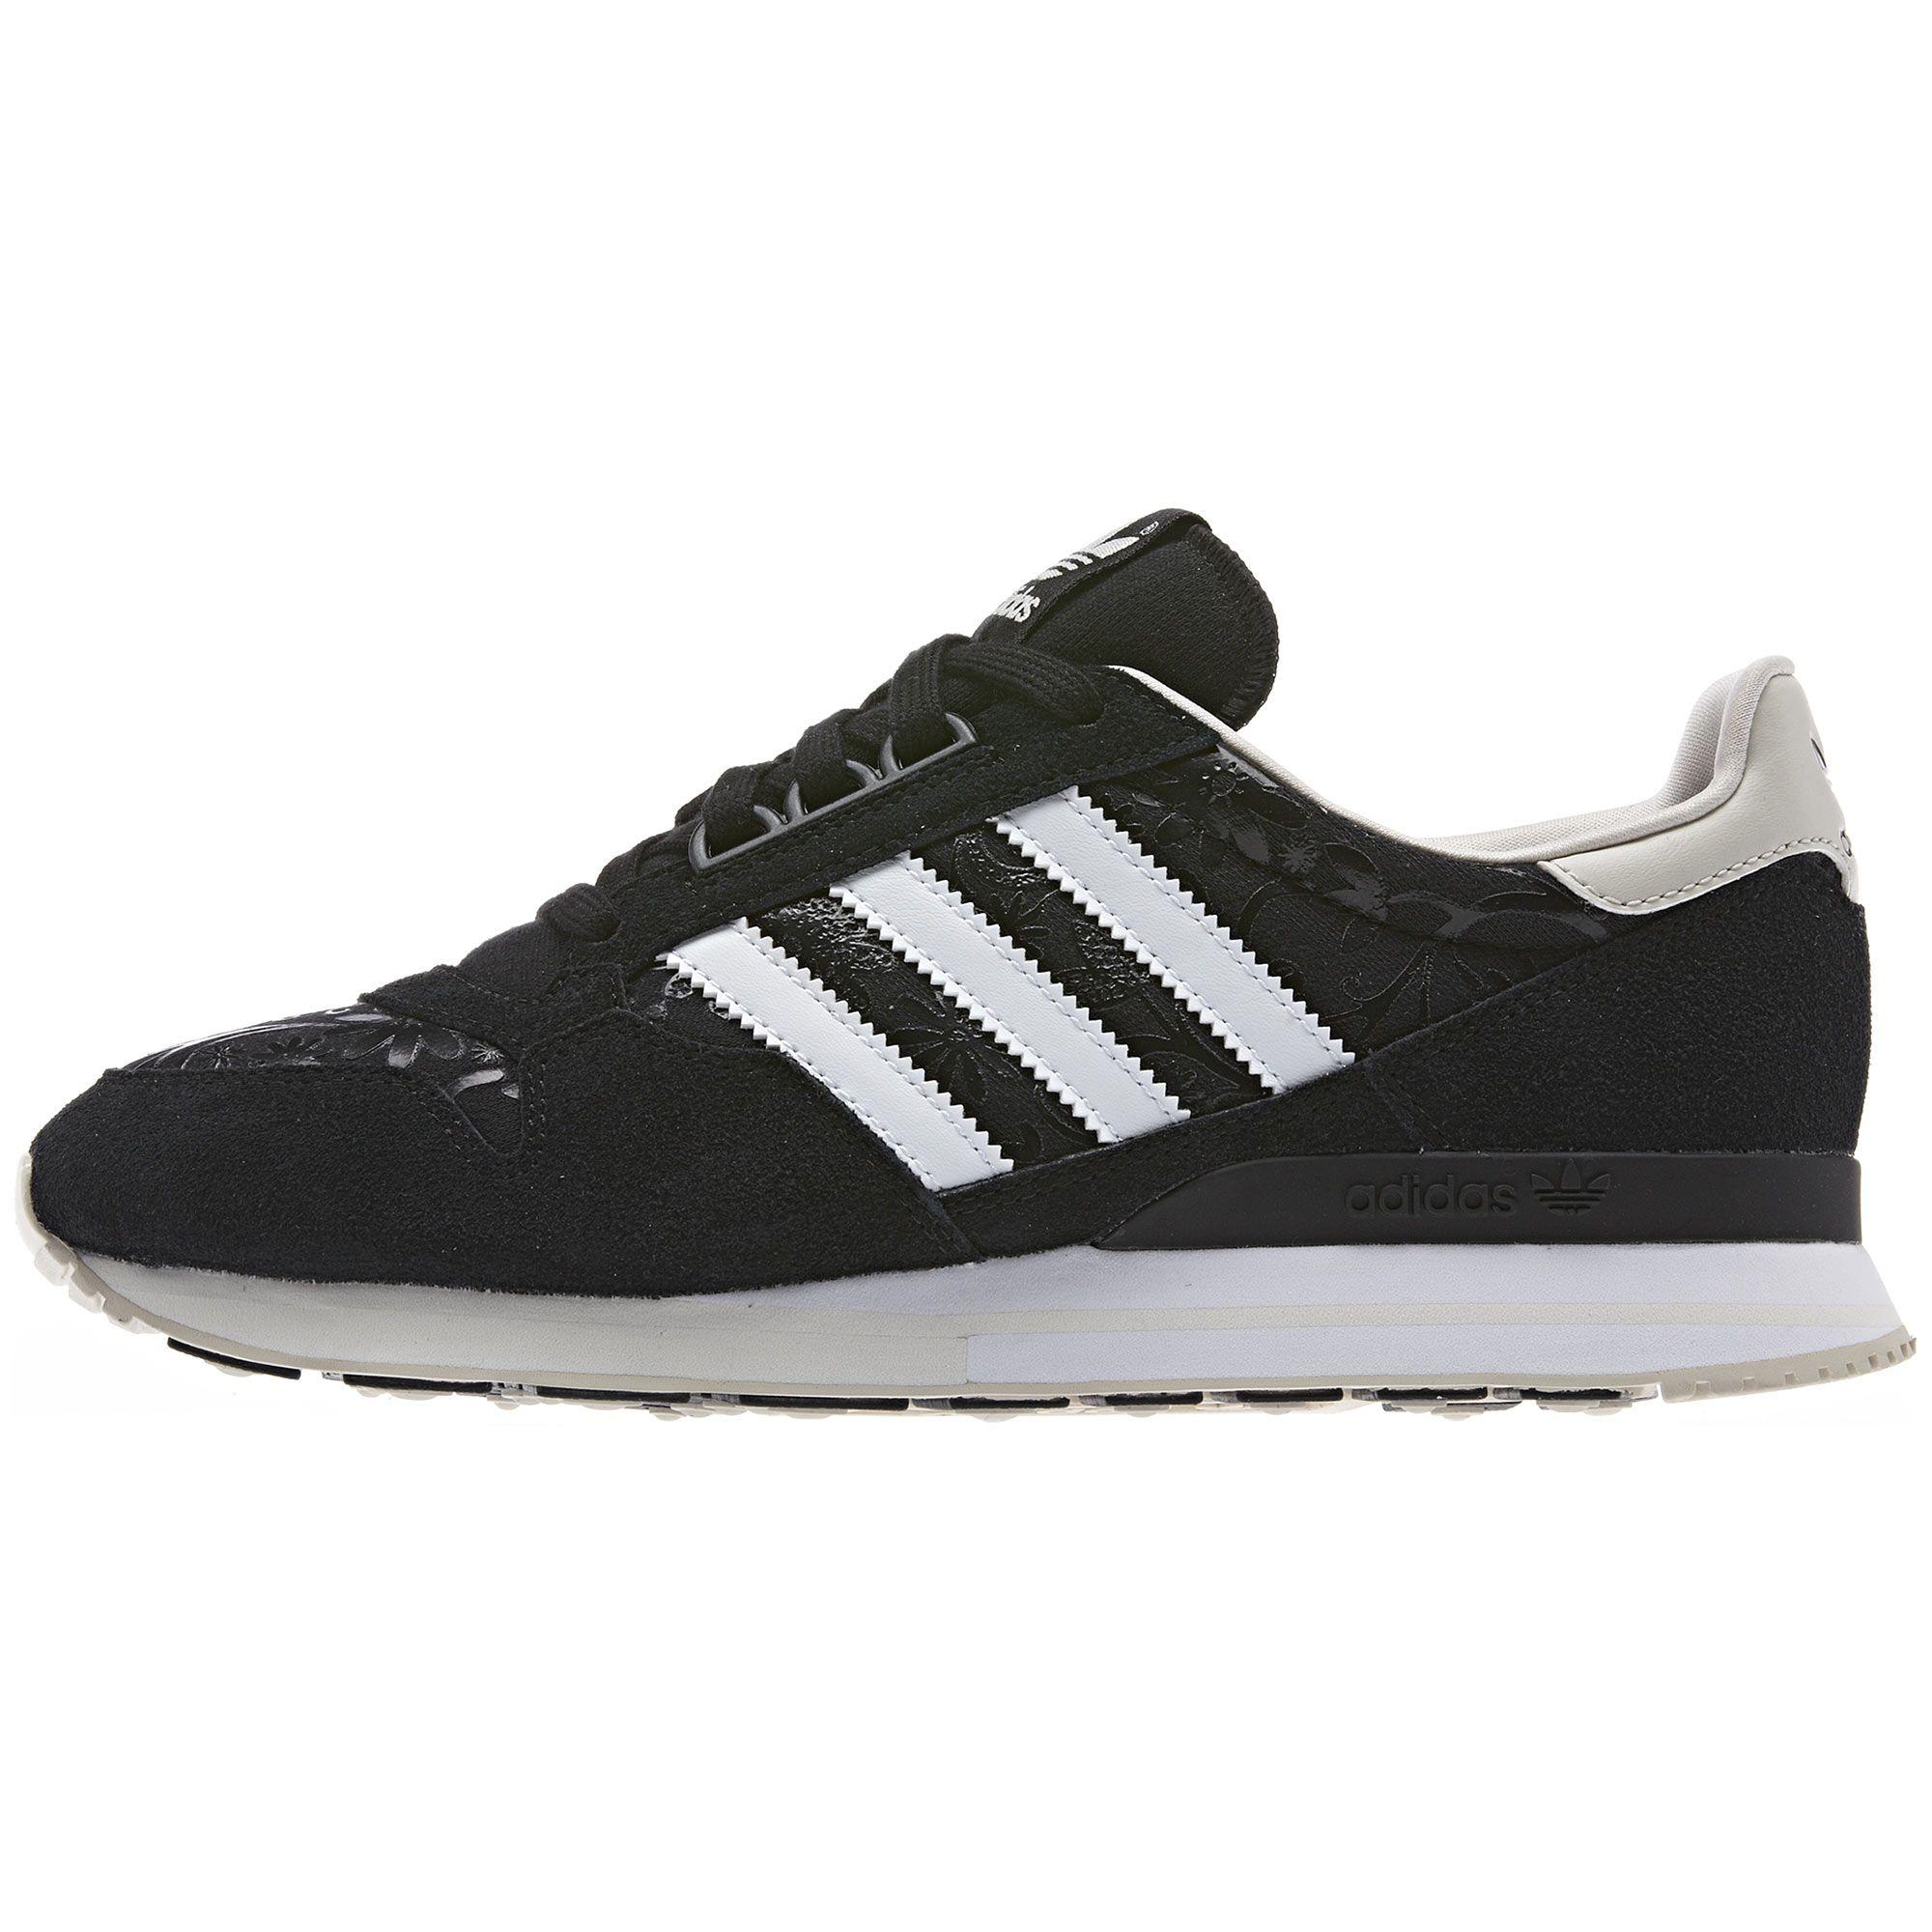 finest selection 9490e 3a47c adidas zx og chaussures chaussures chaussures adidas en irlande juste pour  le plaisir b928af